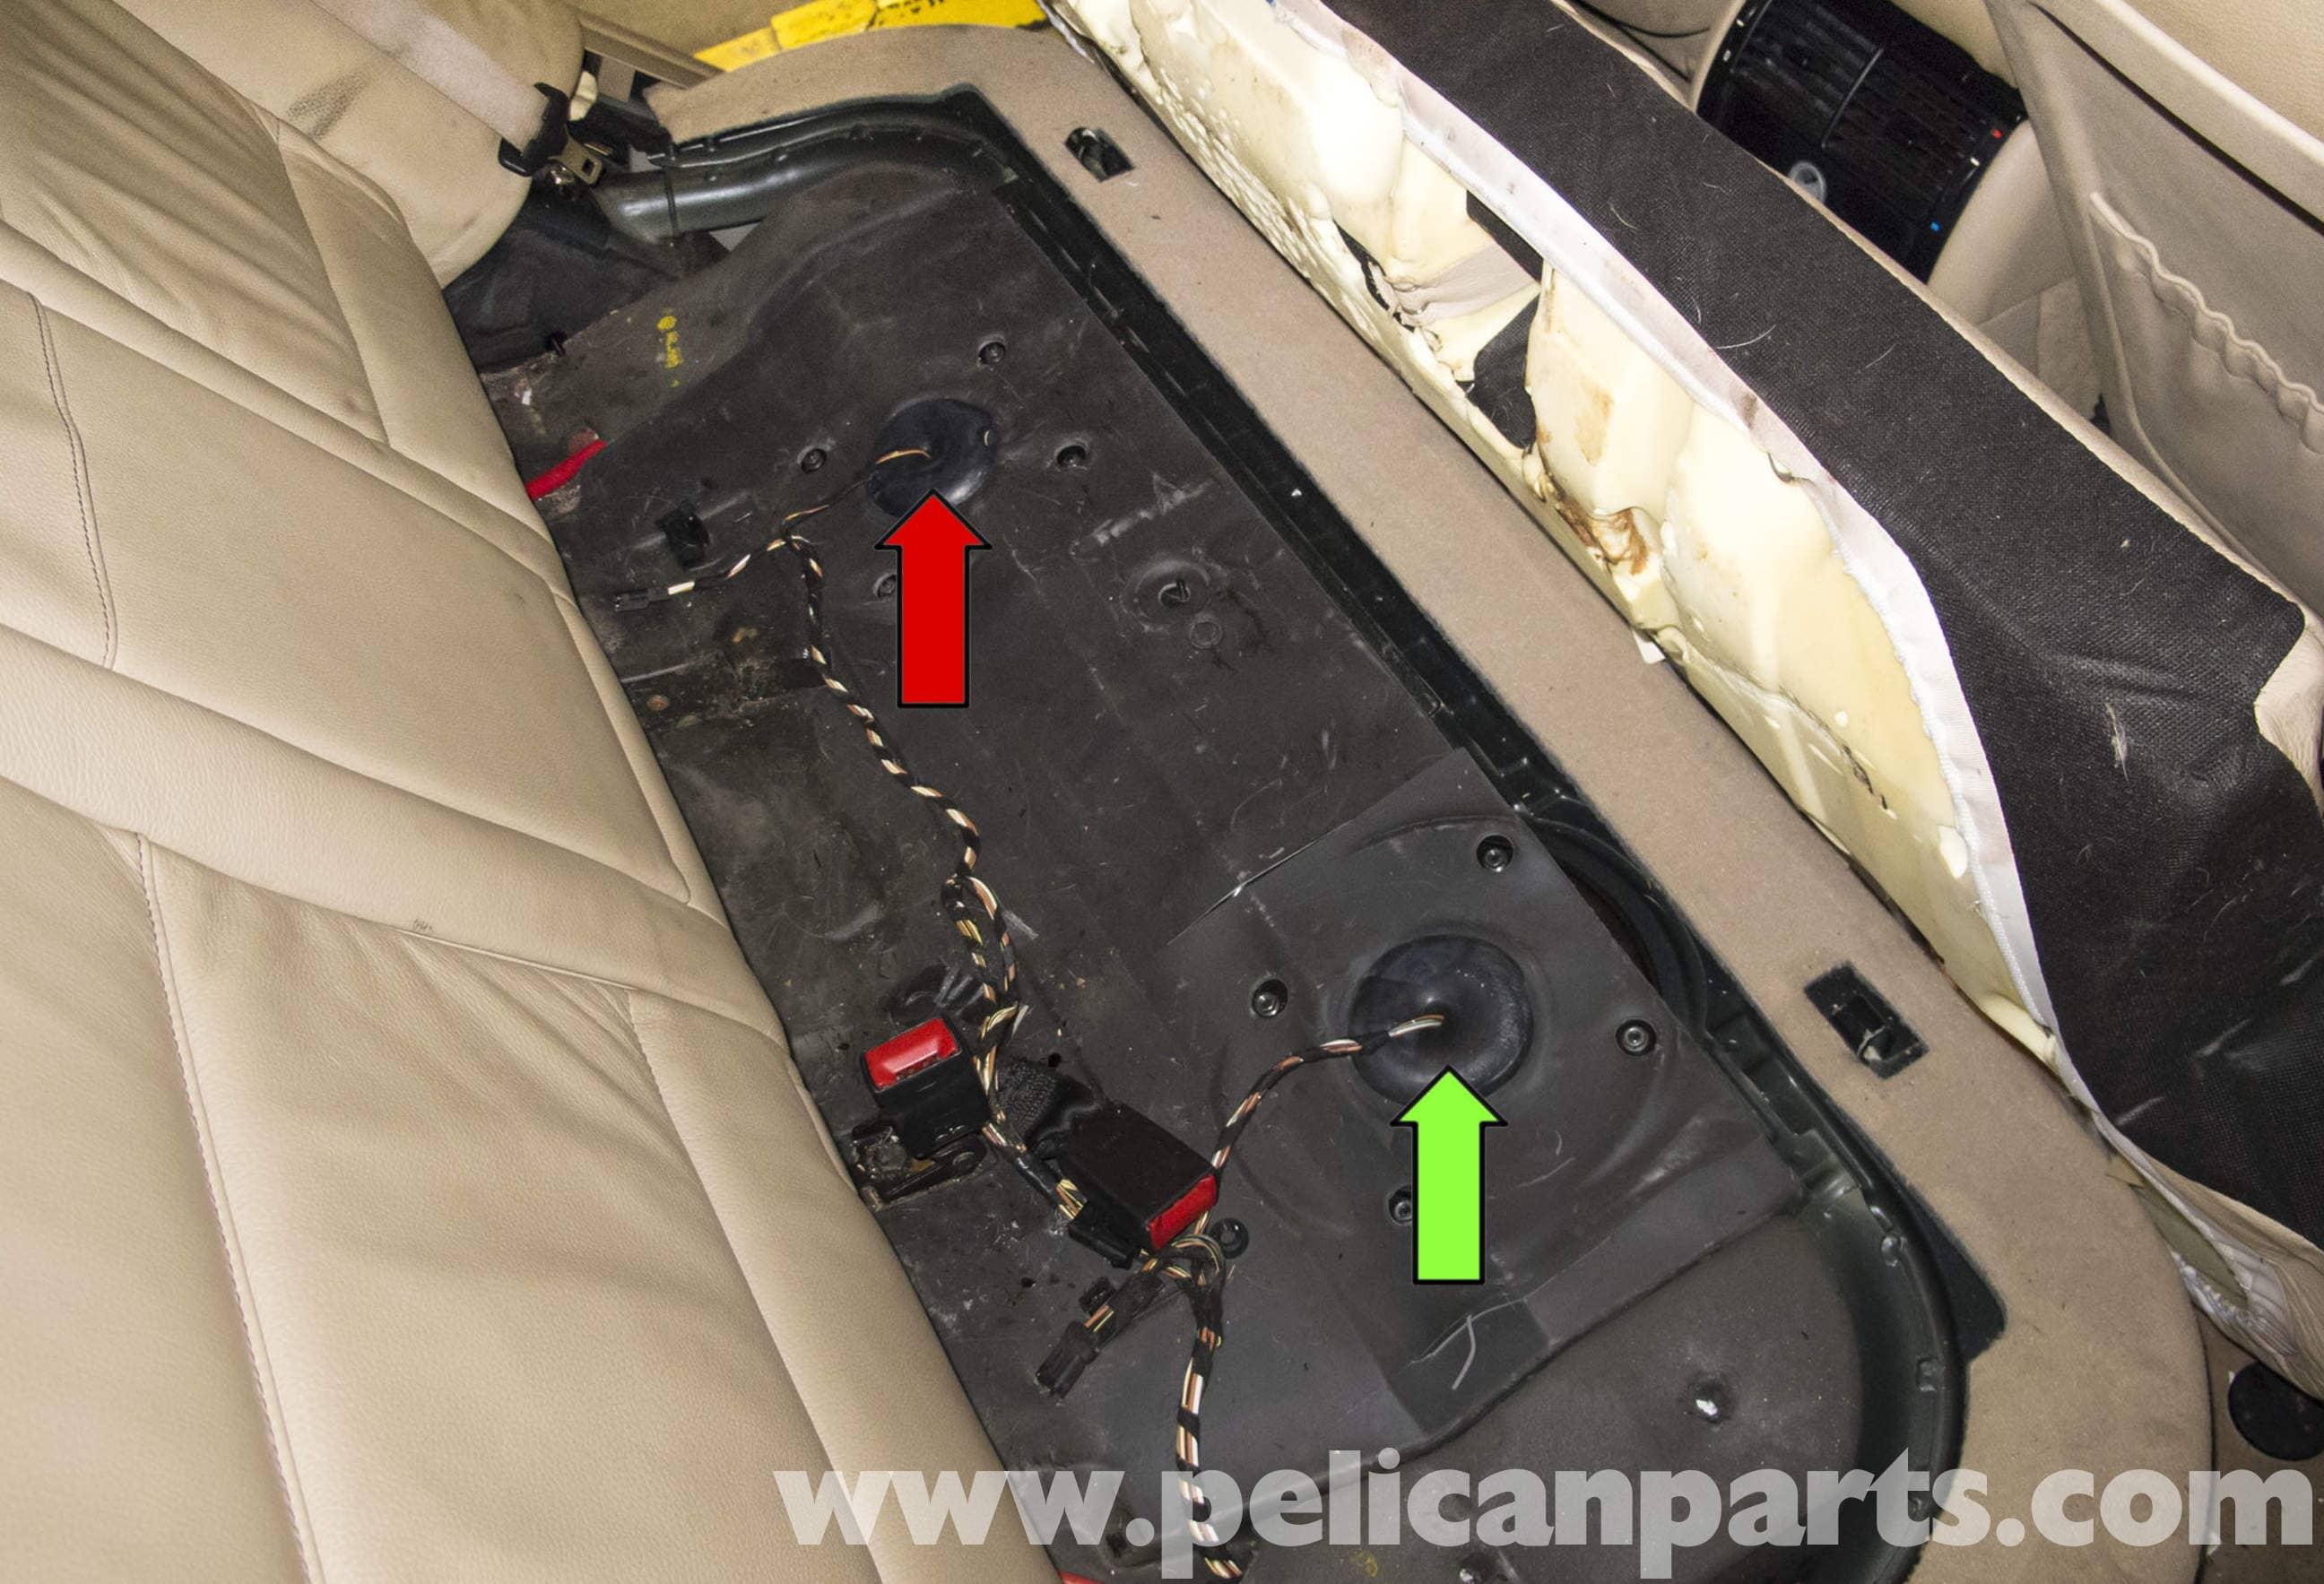 pic01 bmw x5 fuel pump testing (e53 2000 2006) pelican parts diy 2001 BMW X5 Air Suspension Fuse at gsmx.co